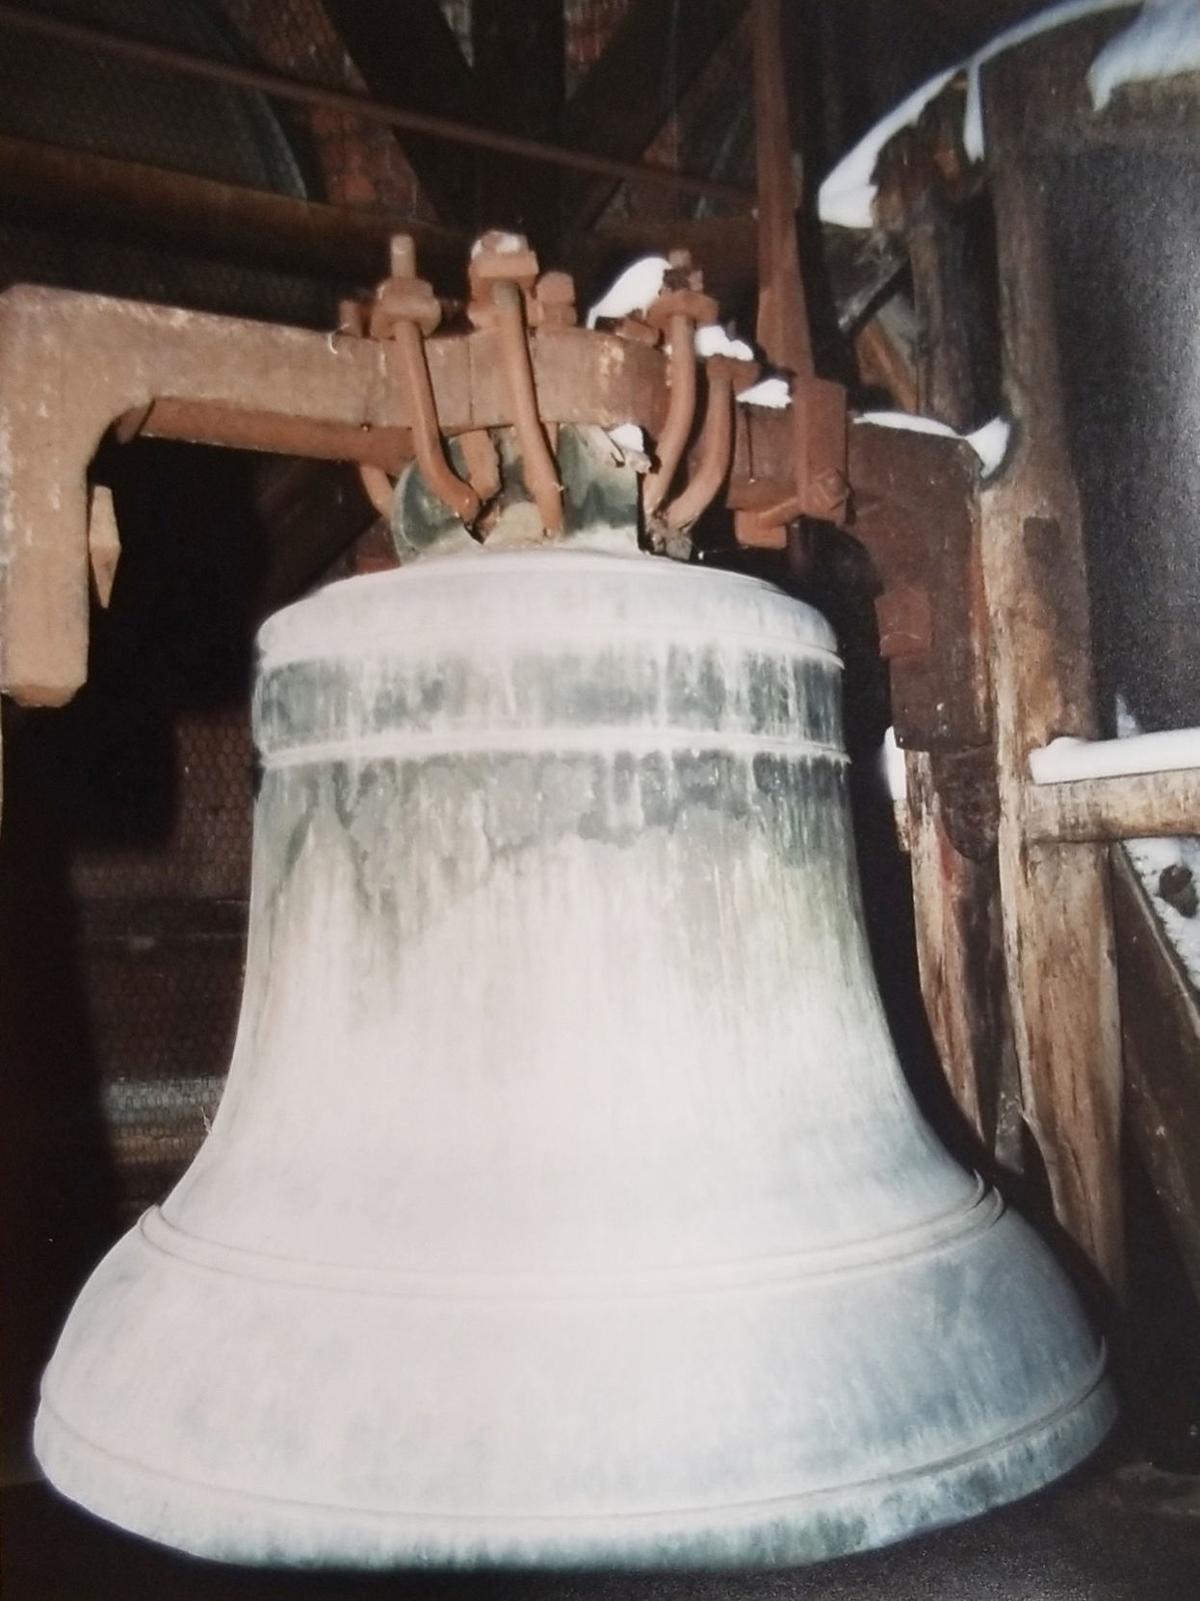 Presbyterian Church bell